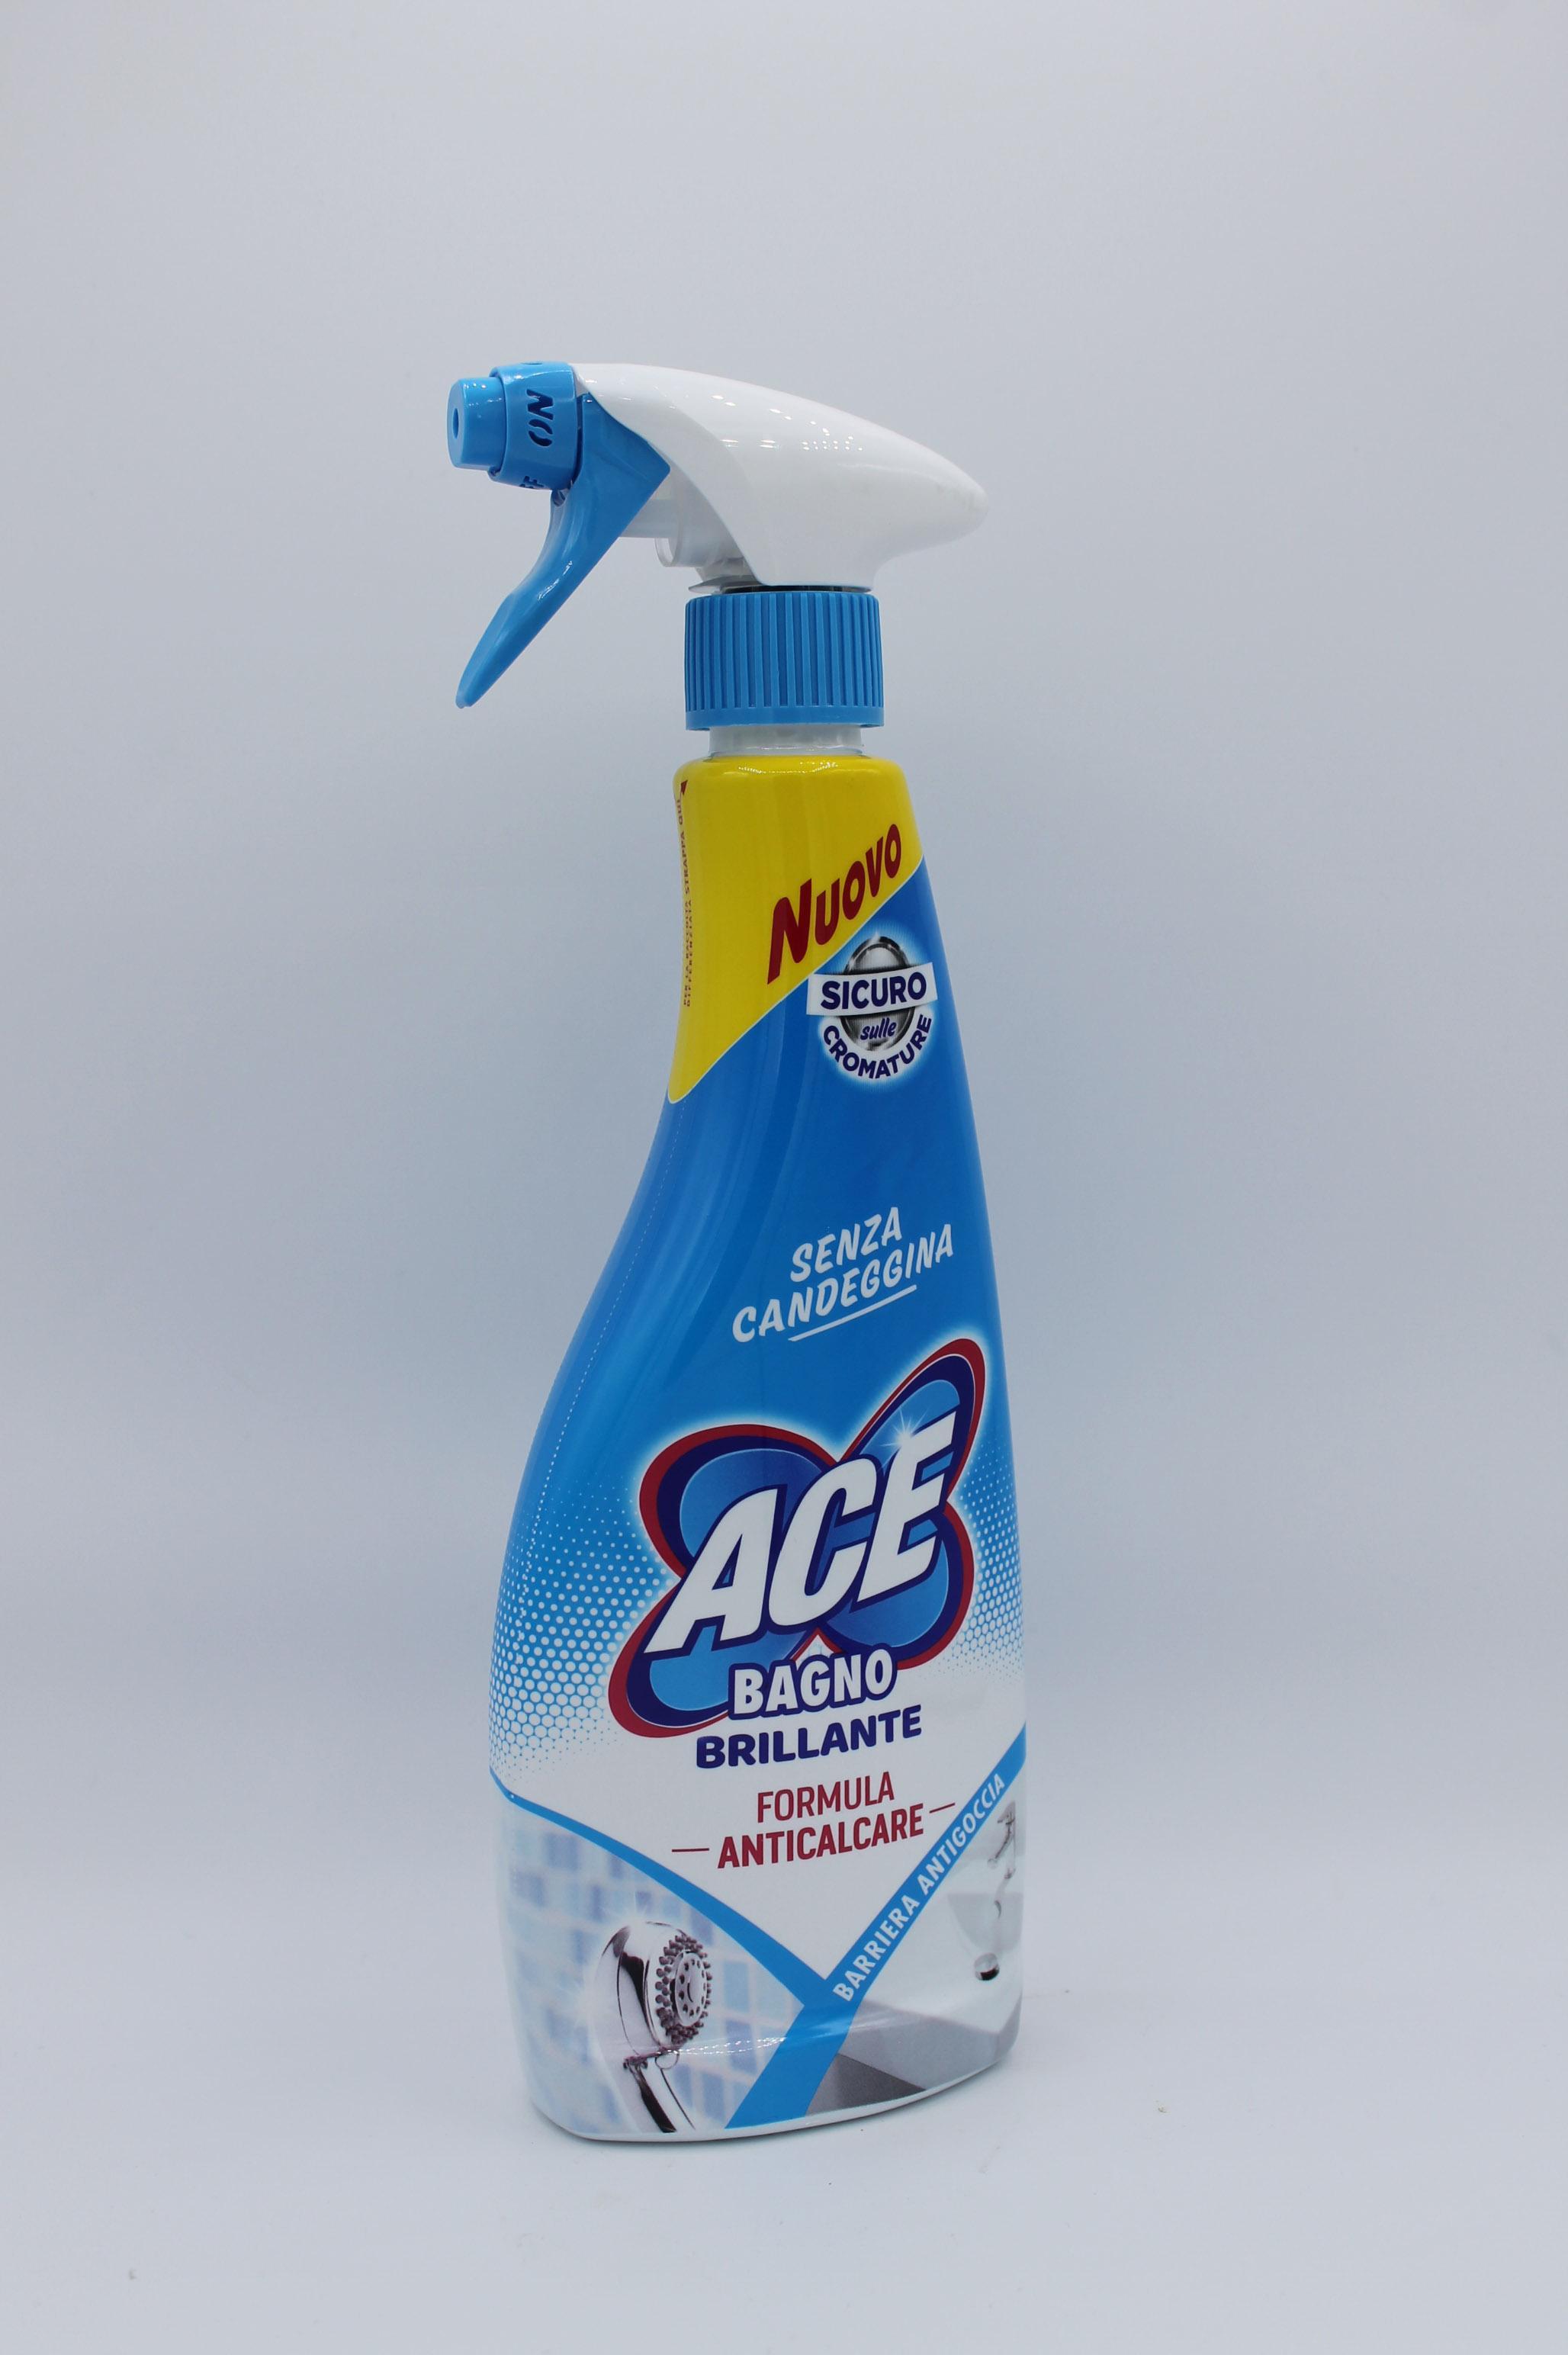 Ace detergente spray bagno 500ml.